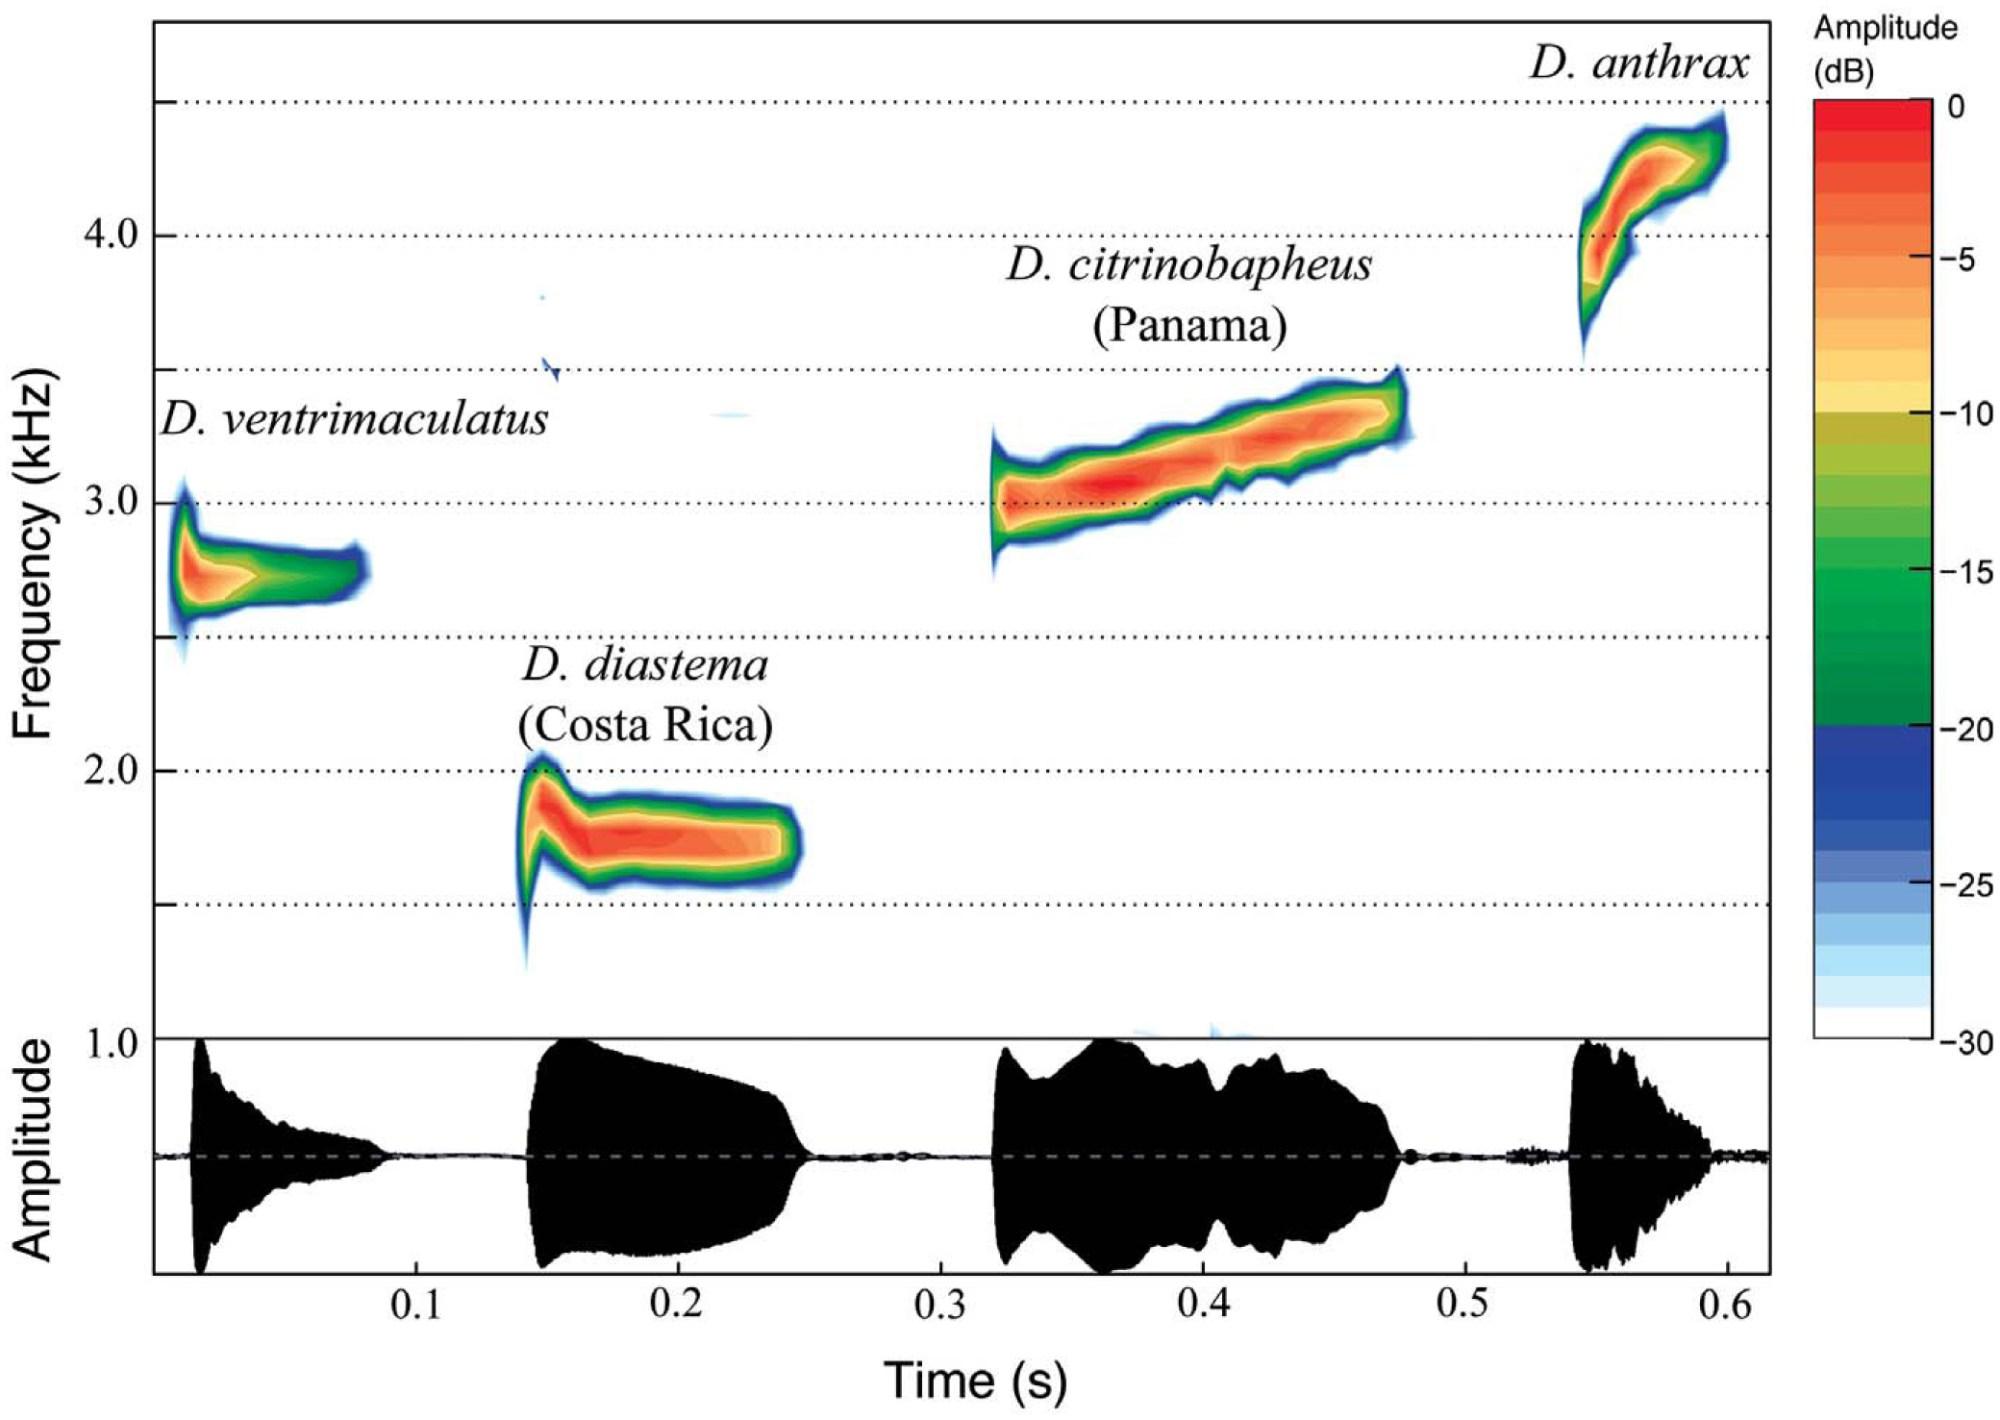 hight resolution of  diastema ku65743 65744 alajuela costa rica d citrinobapheus holotype smf89814 western panama and d anthrax mhua 7303 antioquia colombia